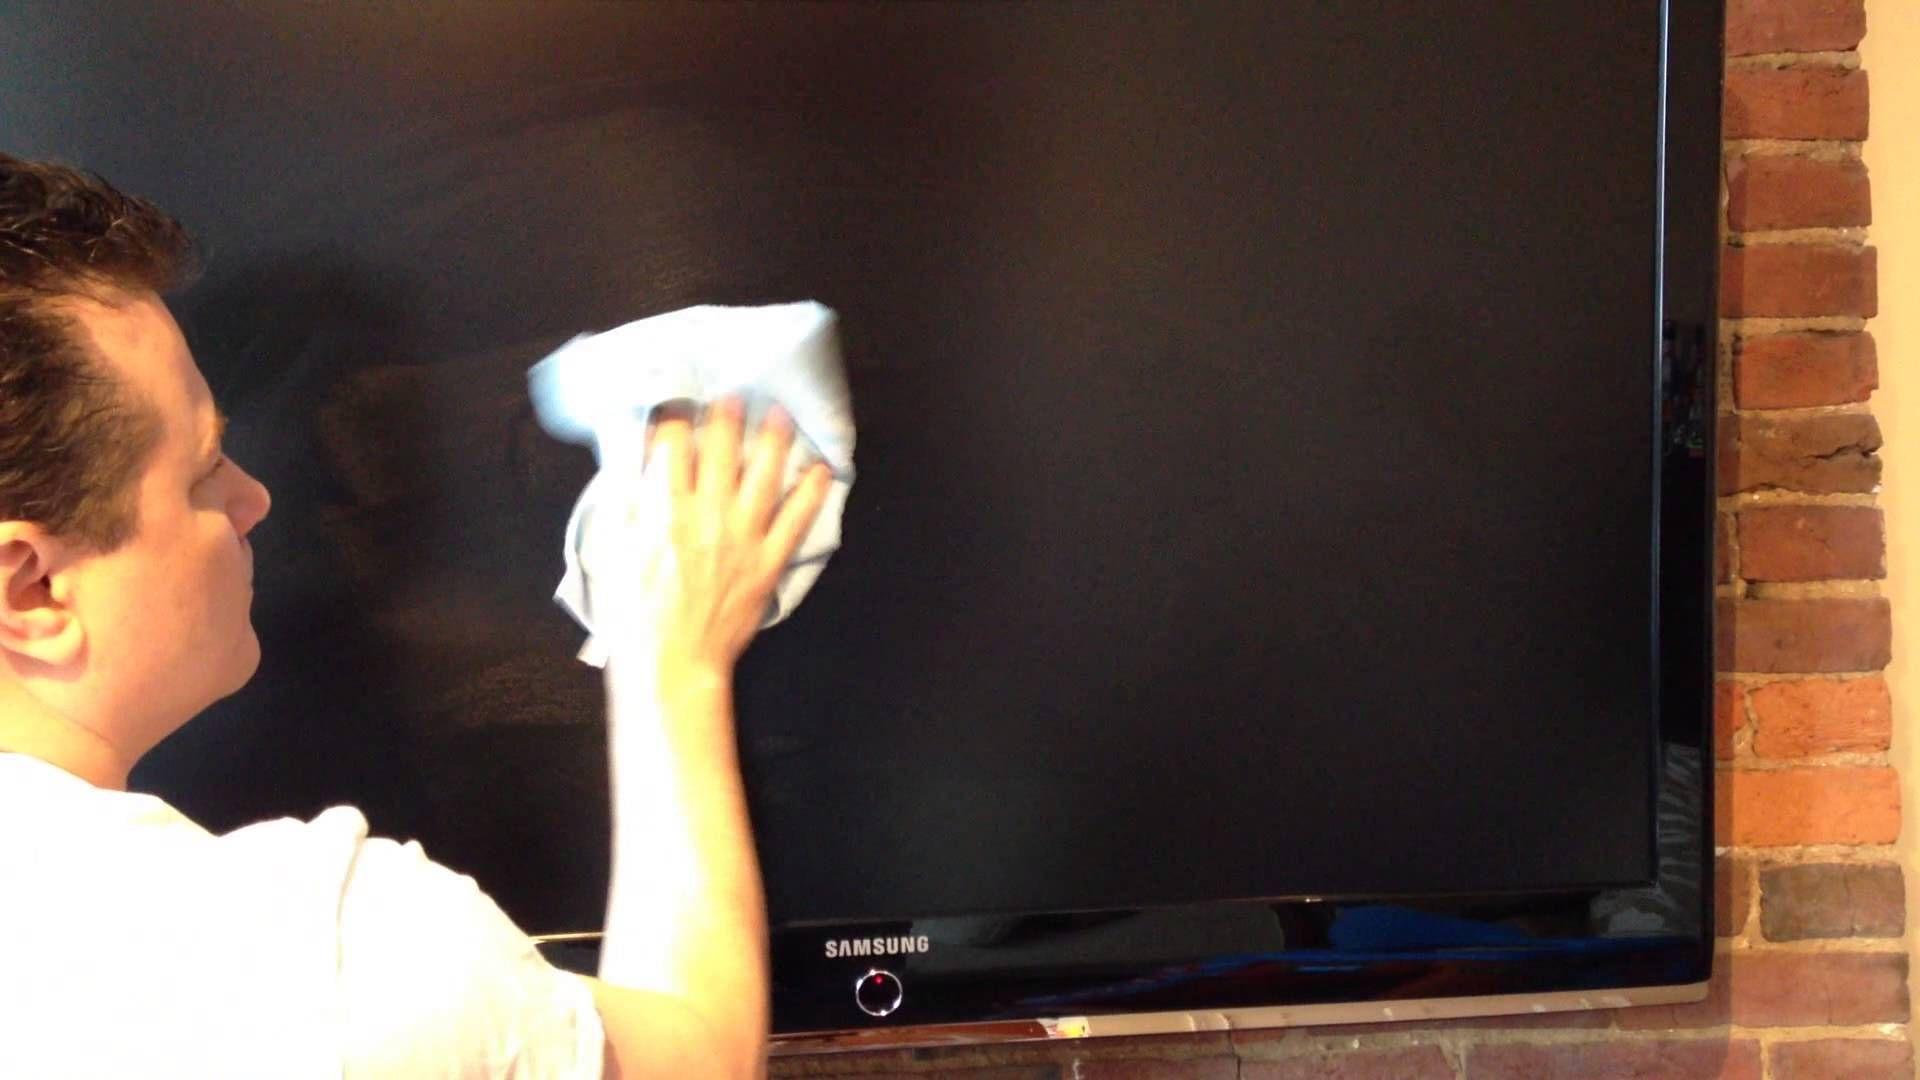 Milk On Samsung Flat Screen Tv Flat Screen Clean Will Remove It Kid Safe Cleaners Flat Screen Samsung Smart Tv